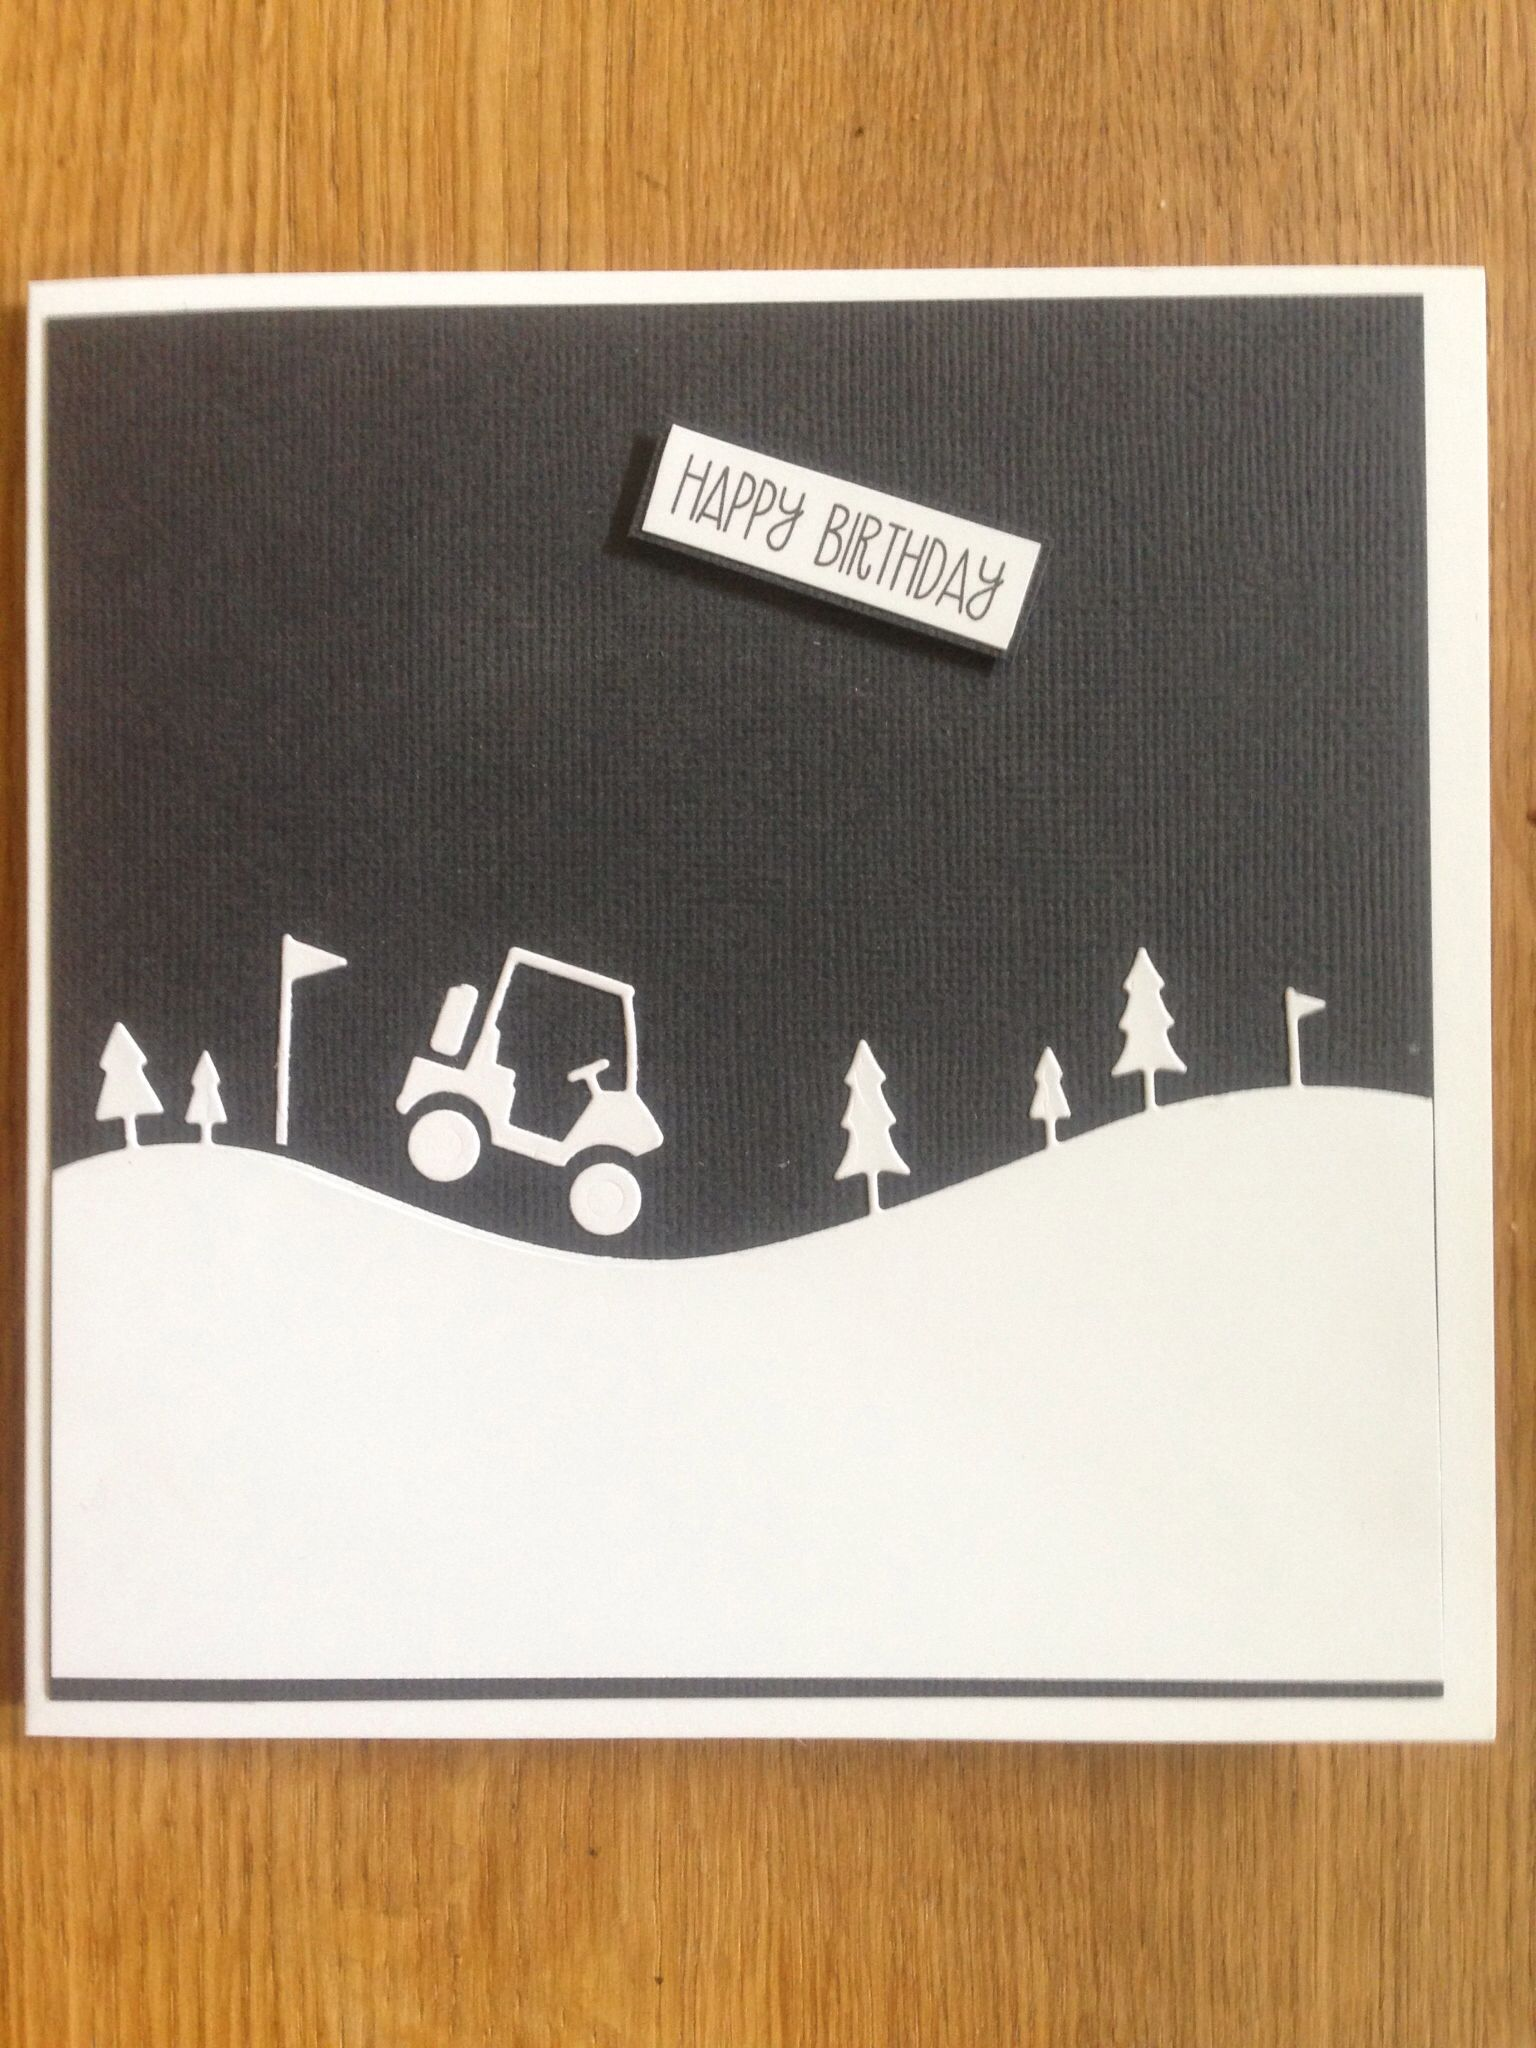 Man Card For Golf Enthusiasts Handmade Cards Pinterest Man Card